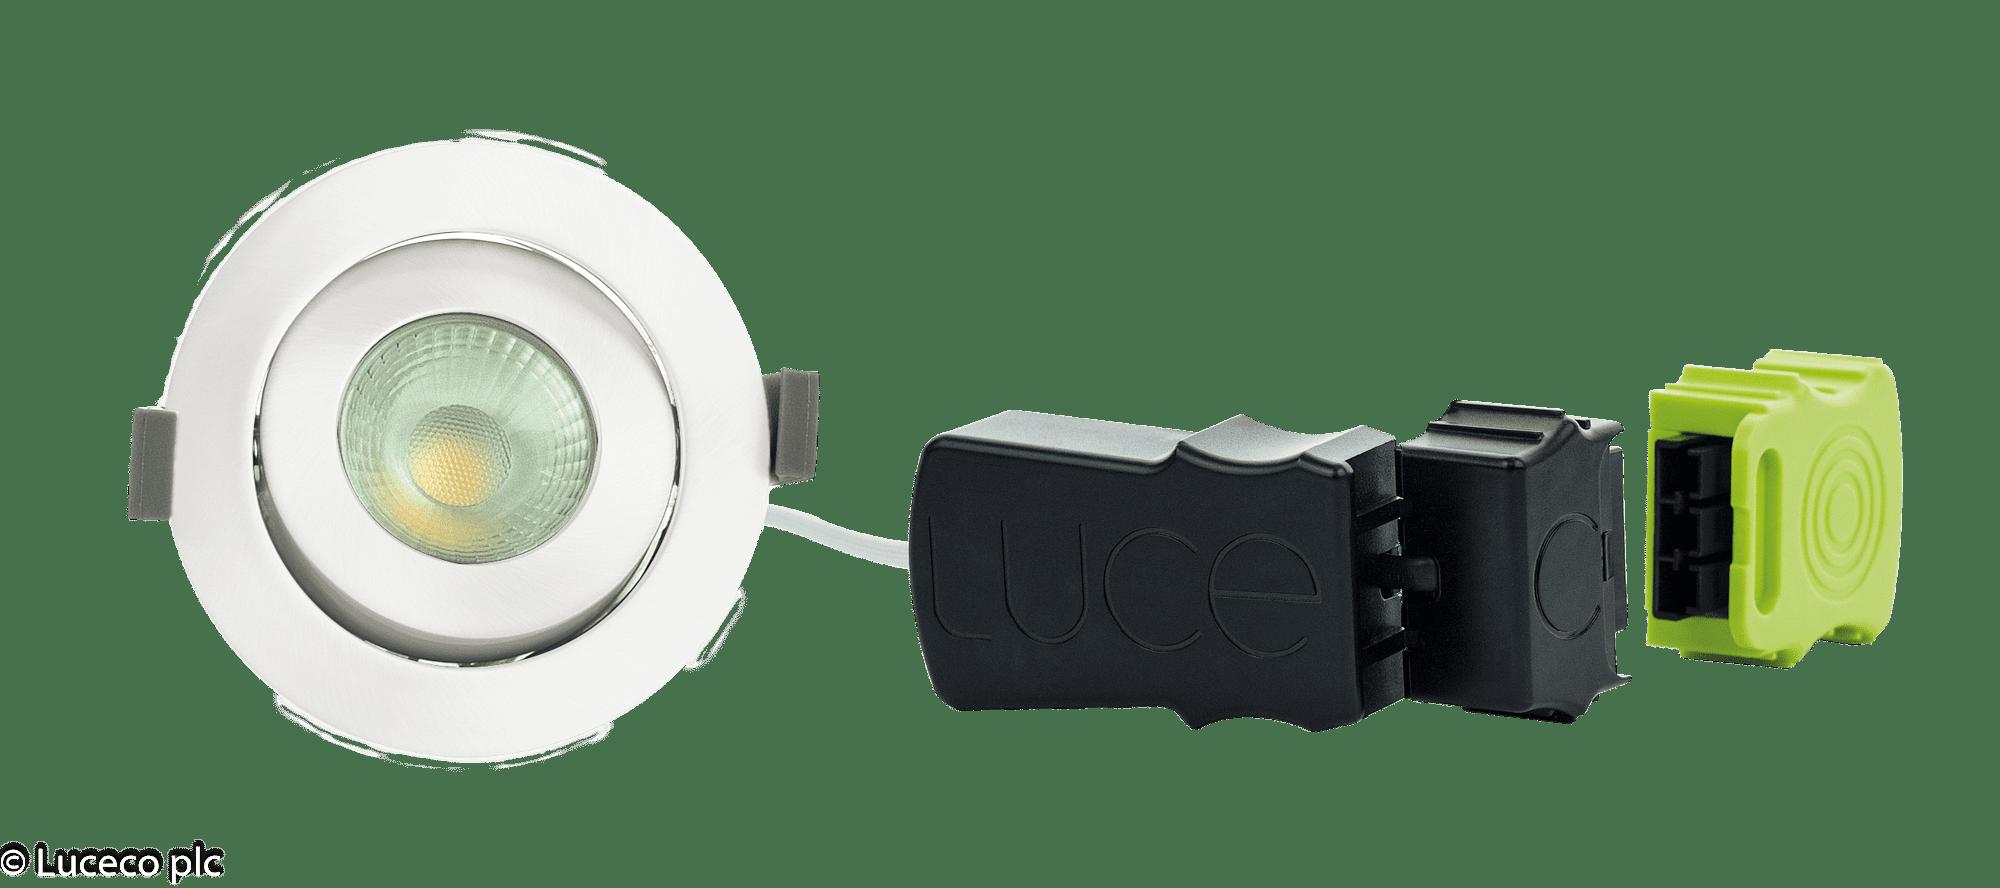 "Luceco LED Einbaustrahler schwenkbar eisengeb. ""Element"" 8W  3000K 800lm dimmbar LDEA9W8D30eisen"